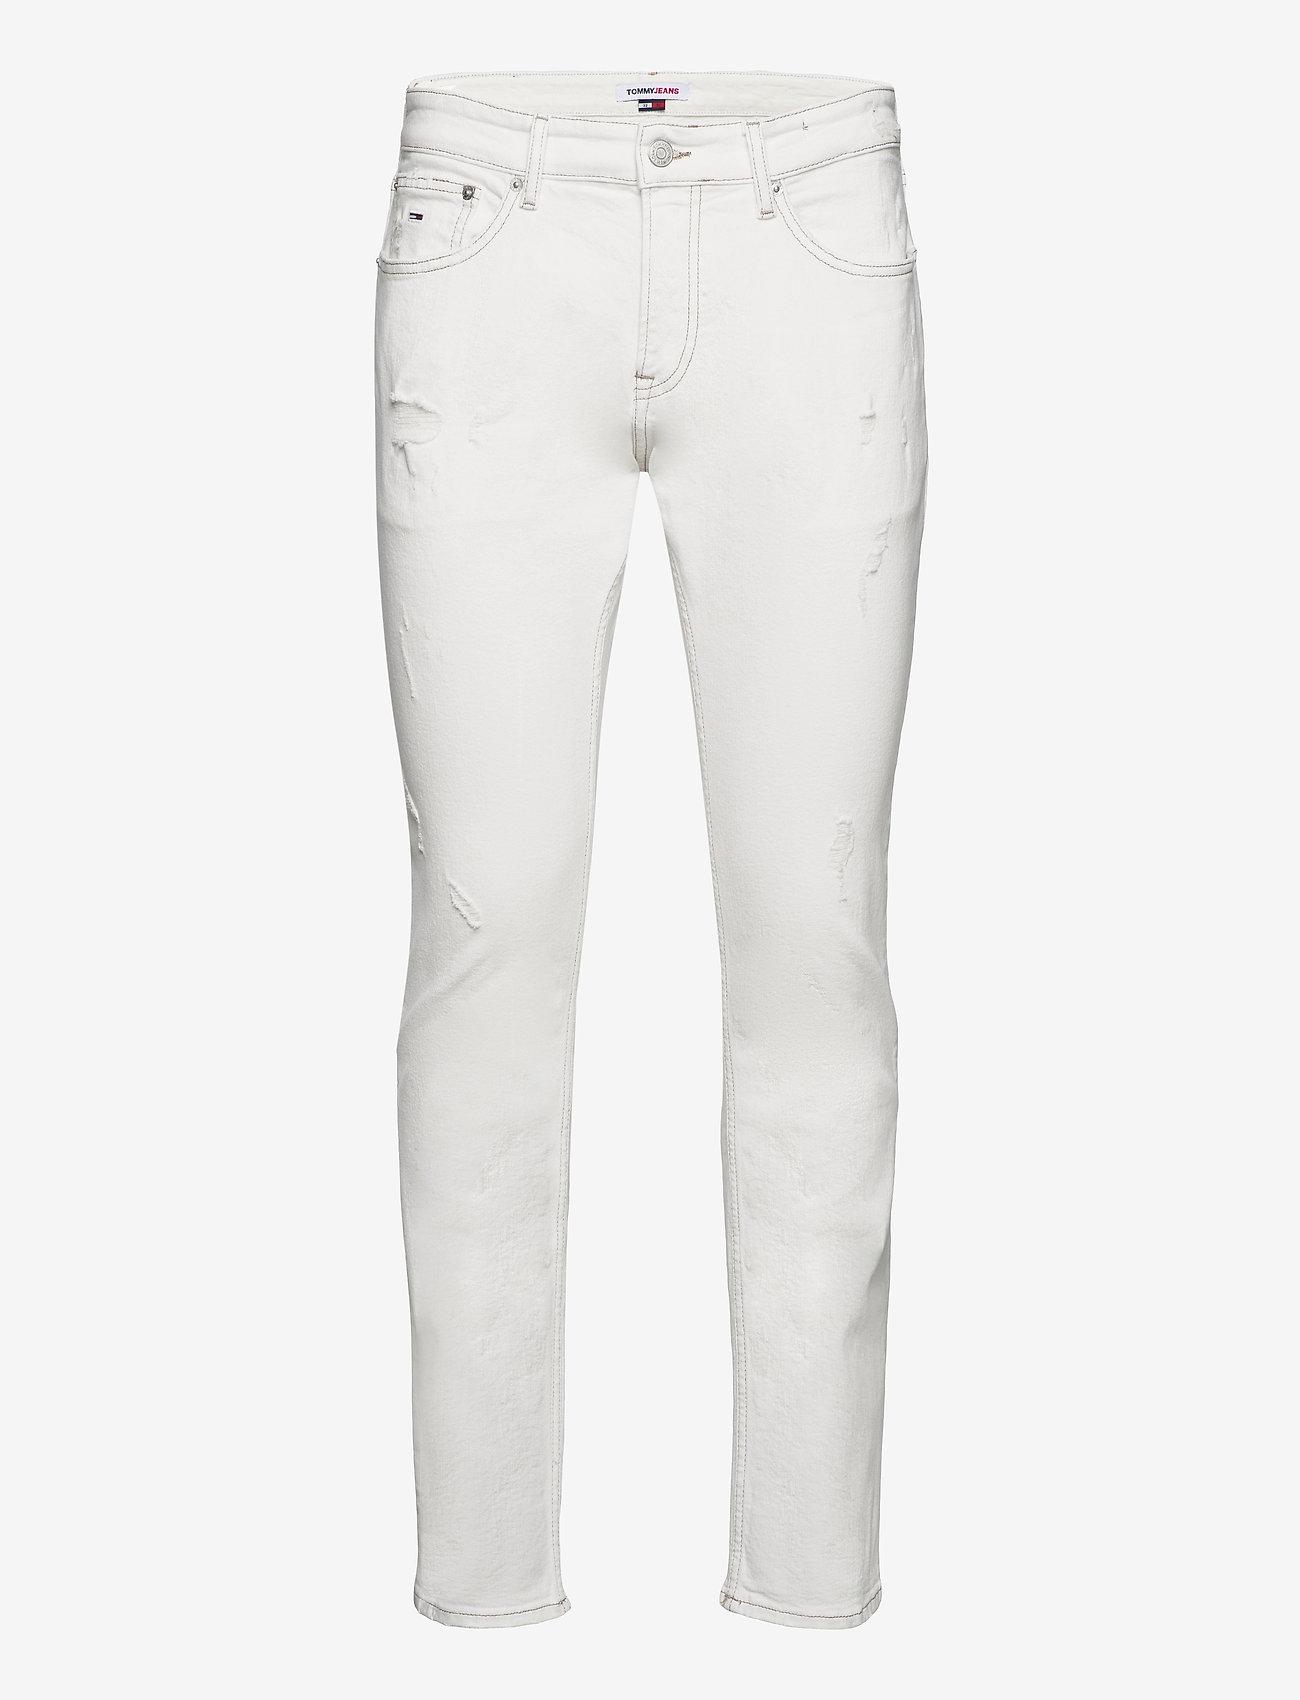 Tommy Jeans - SCANTON SLIM OWCD - slim jeans - optic wh com destr - 0